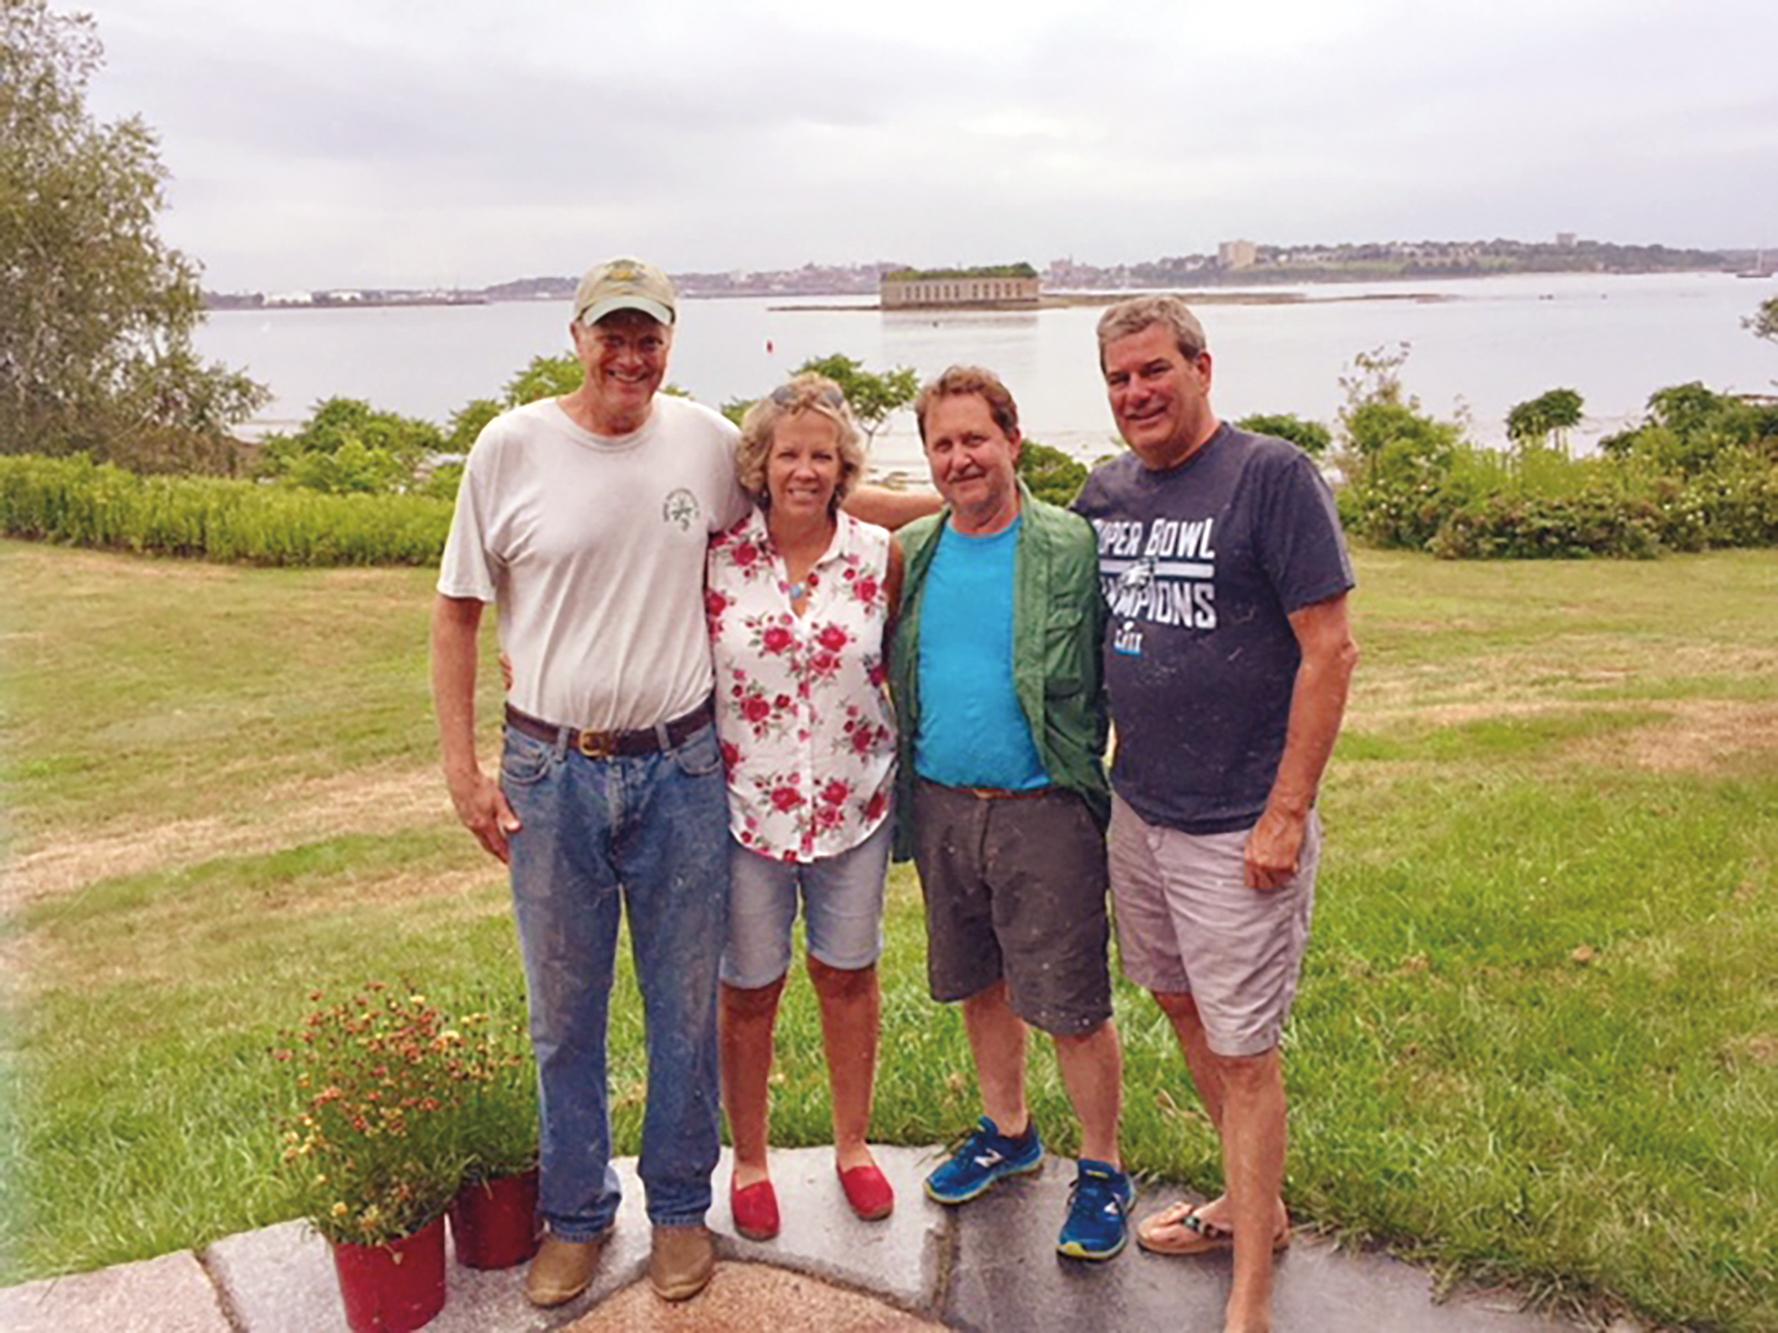 1977 Formmates (l. to r.) Bill Reynolds, Talie Ward Harris, Matthew St Onge, and Warren Ingersoll on Little Diamond Island in Maine.